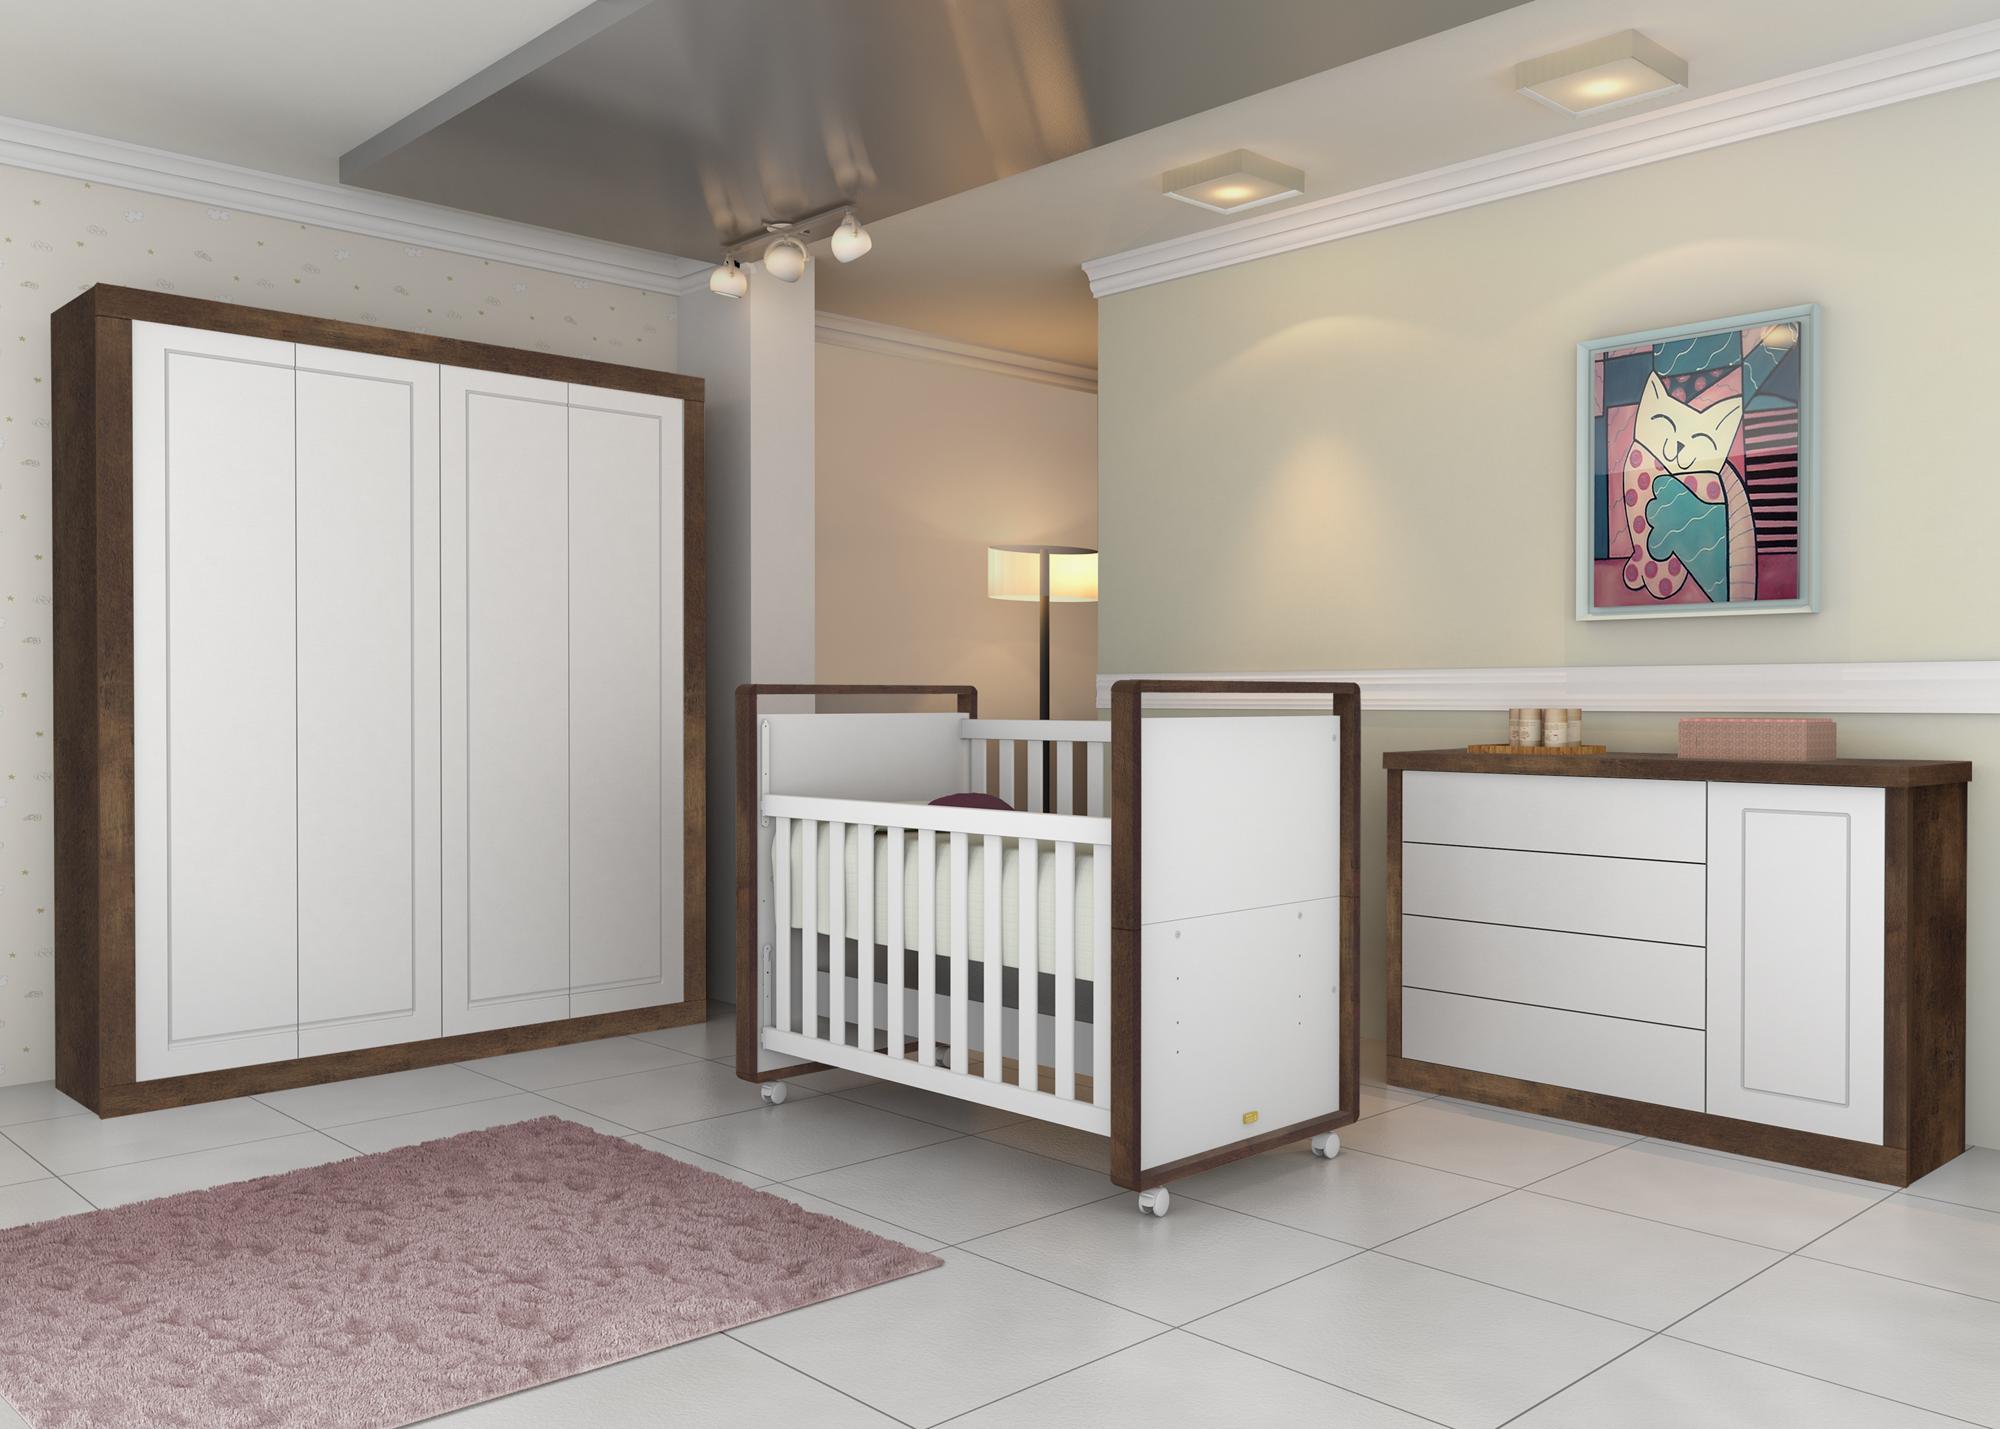 Dormitorio TuTTo Matic/ Branco amadeirado